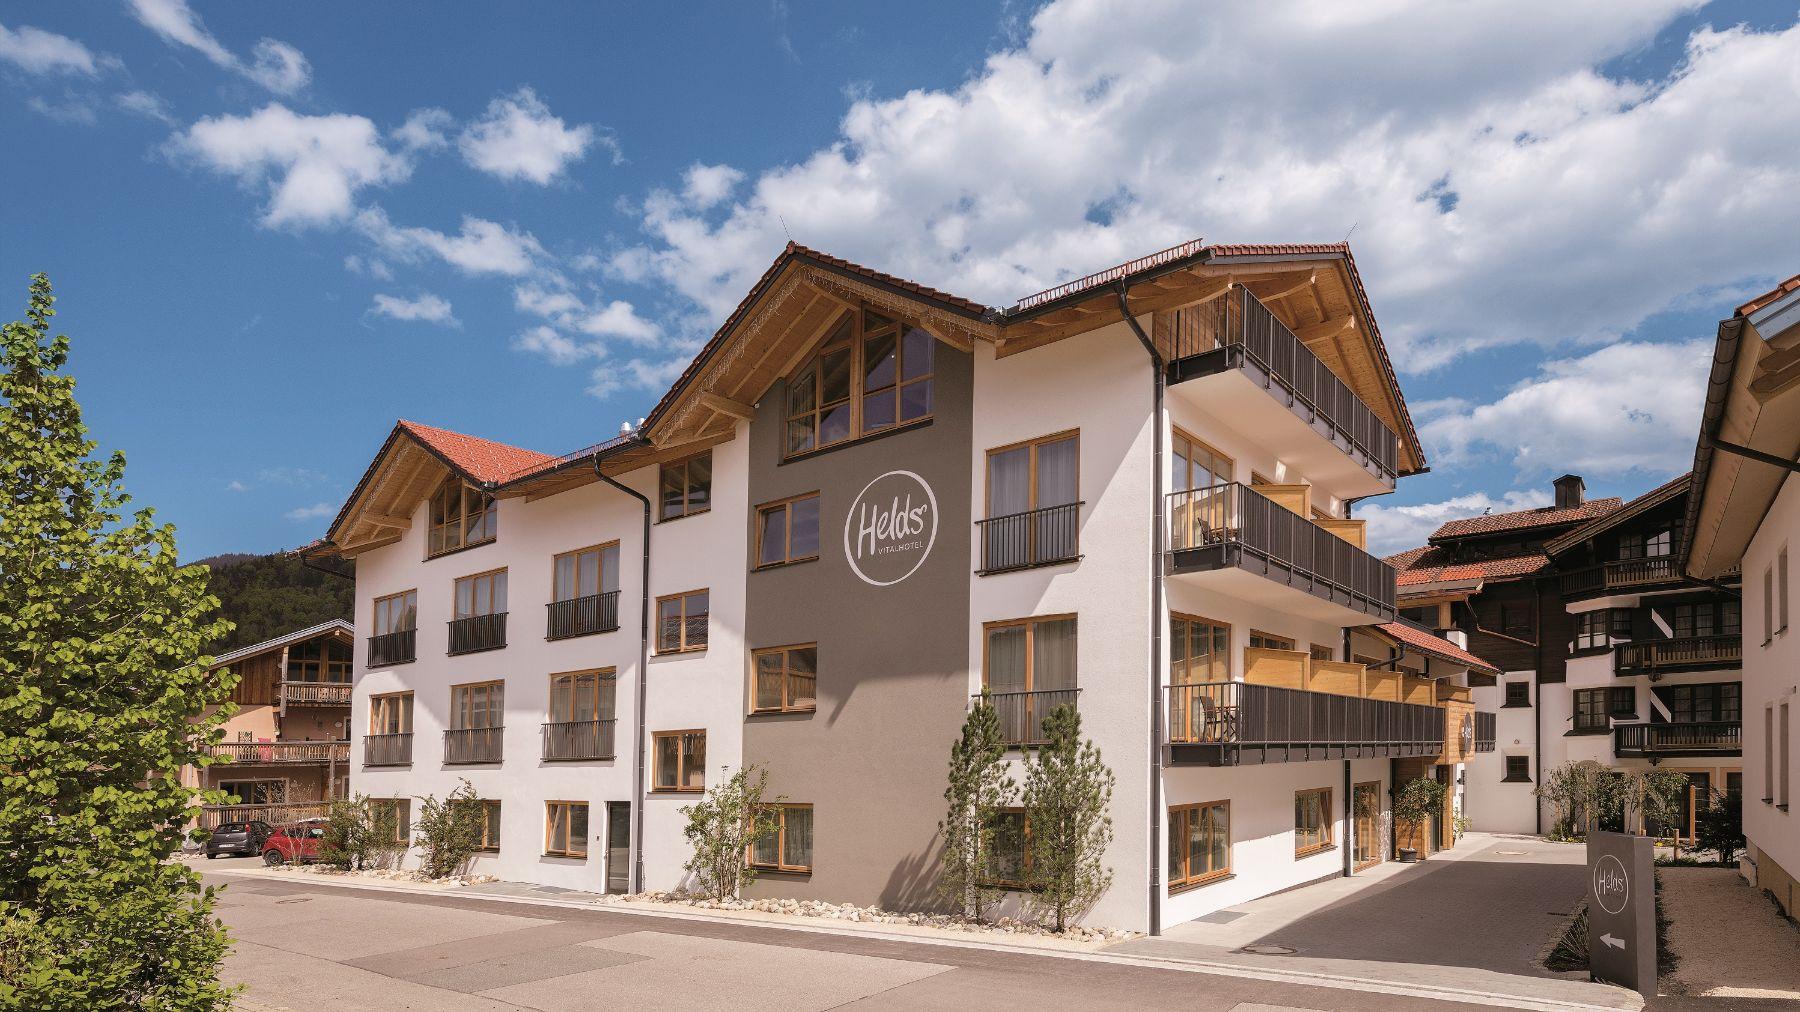 10 Tage Vital & Aktivzeit im Chiemgau